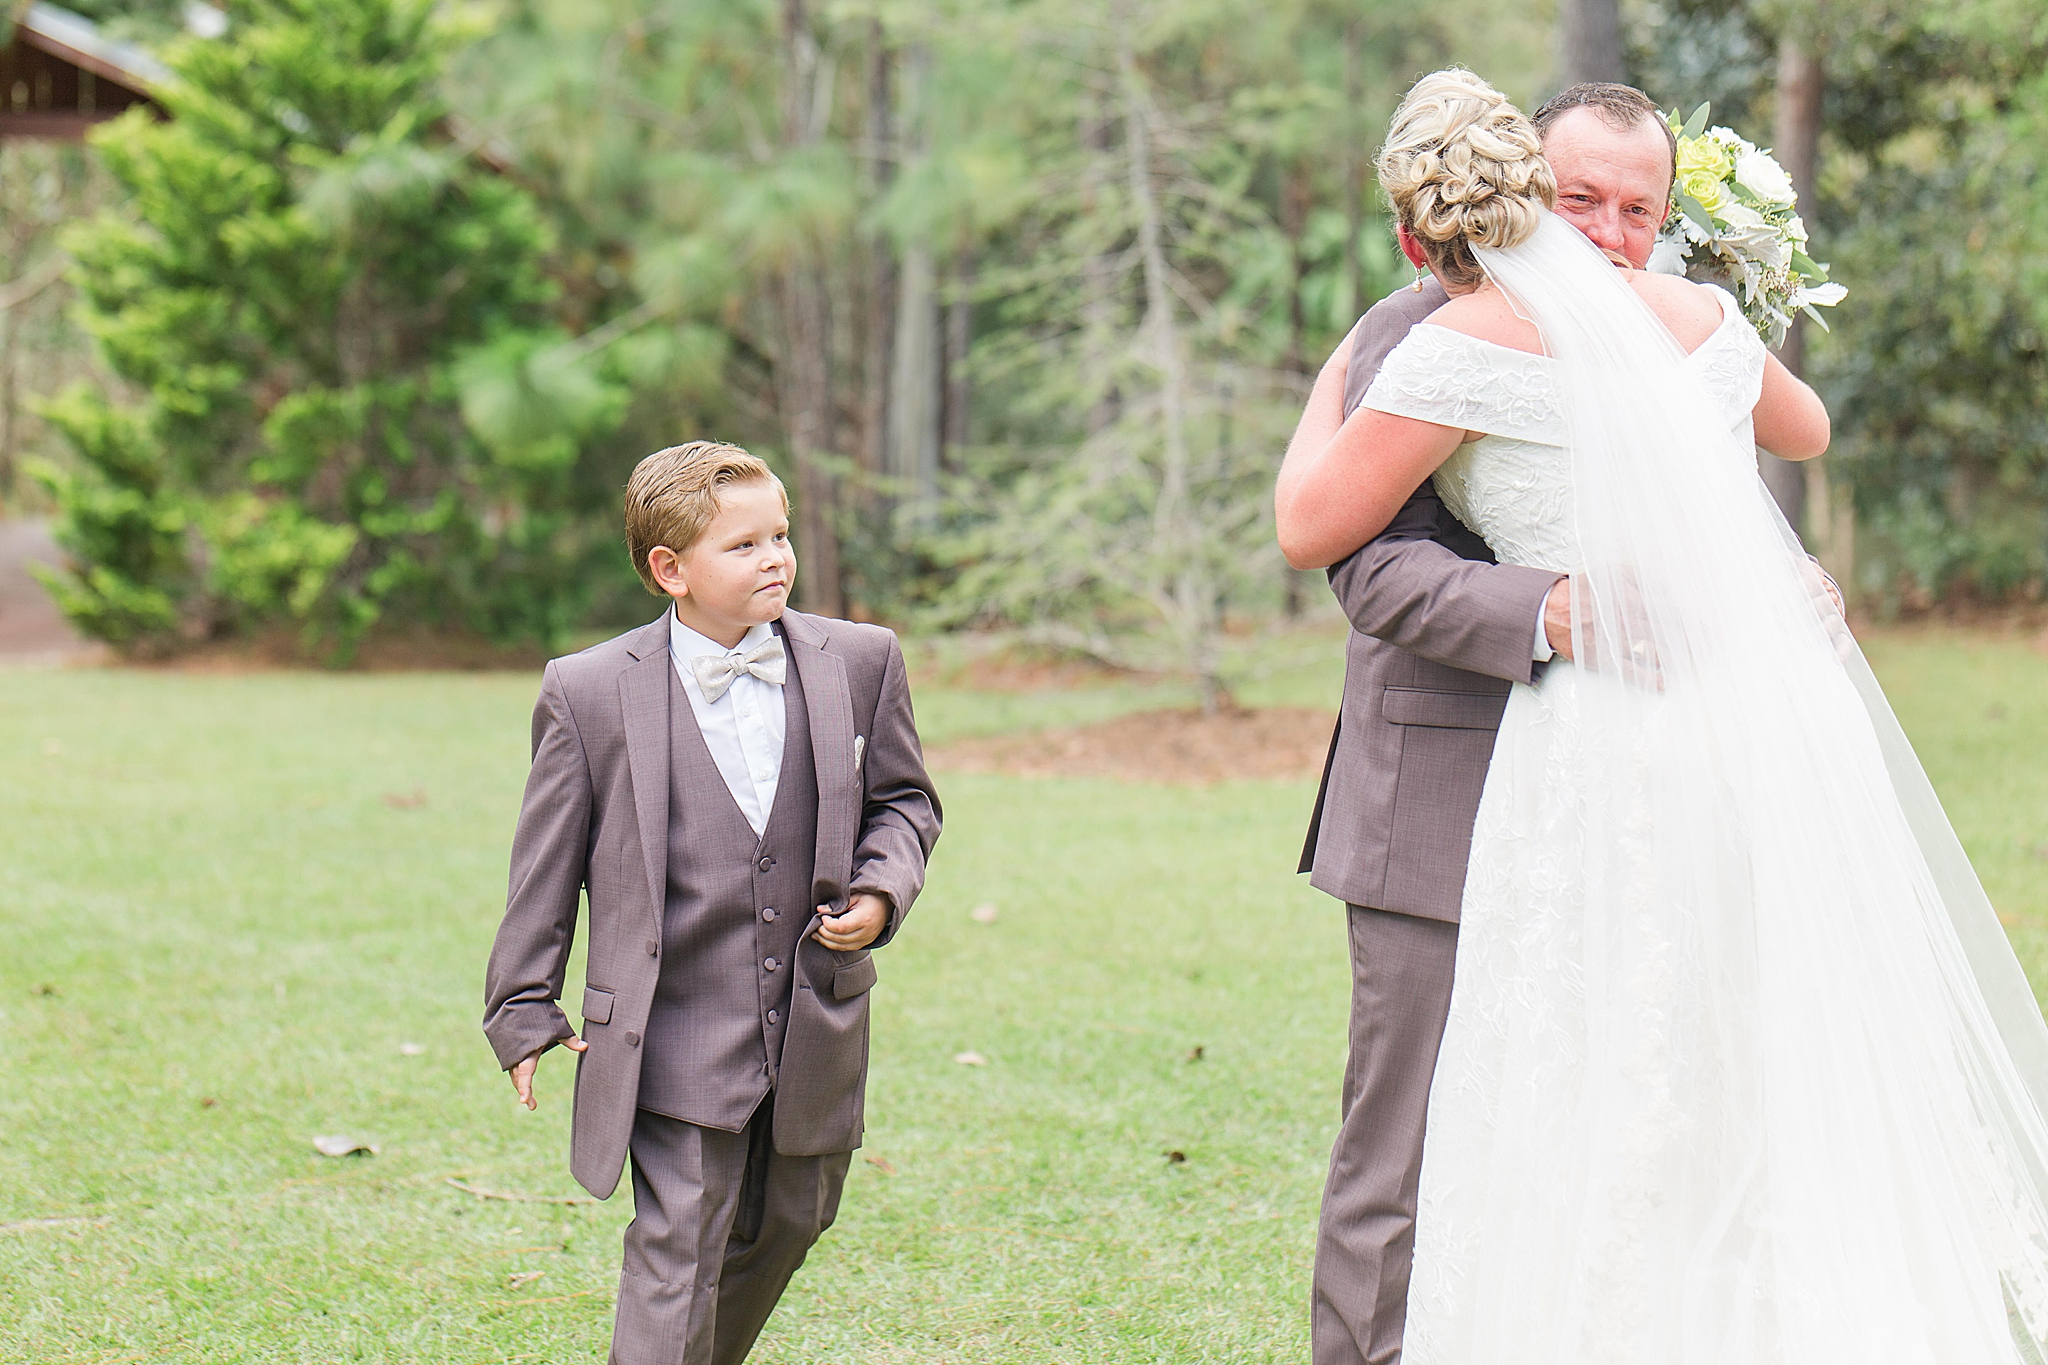 emotional first look on wedding day in AL